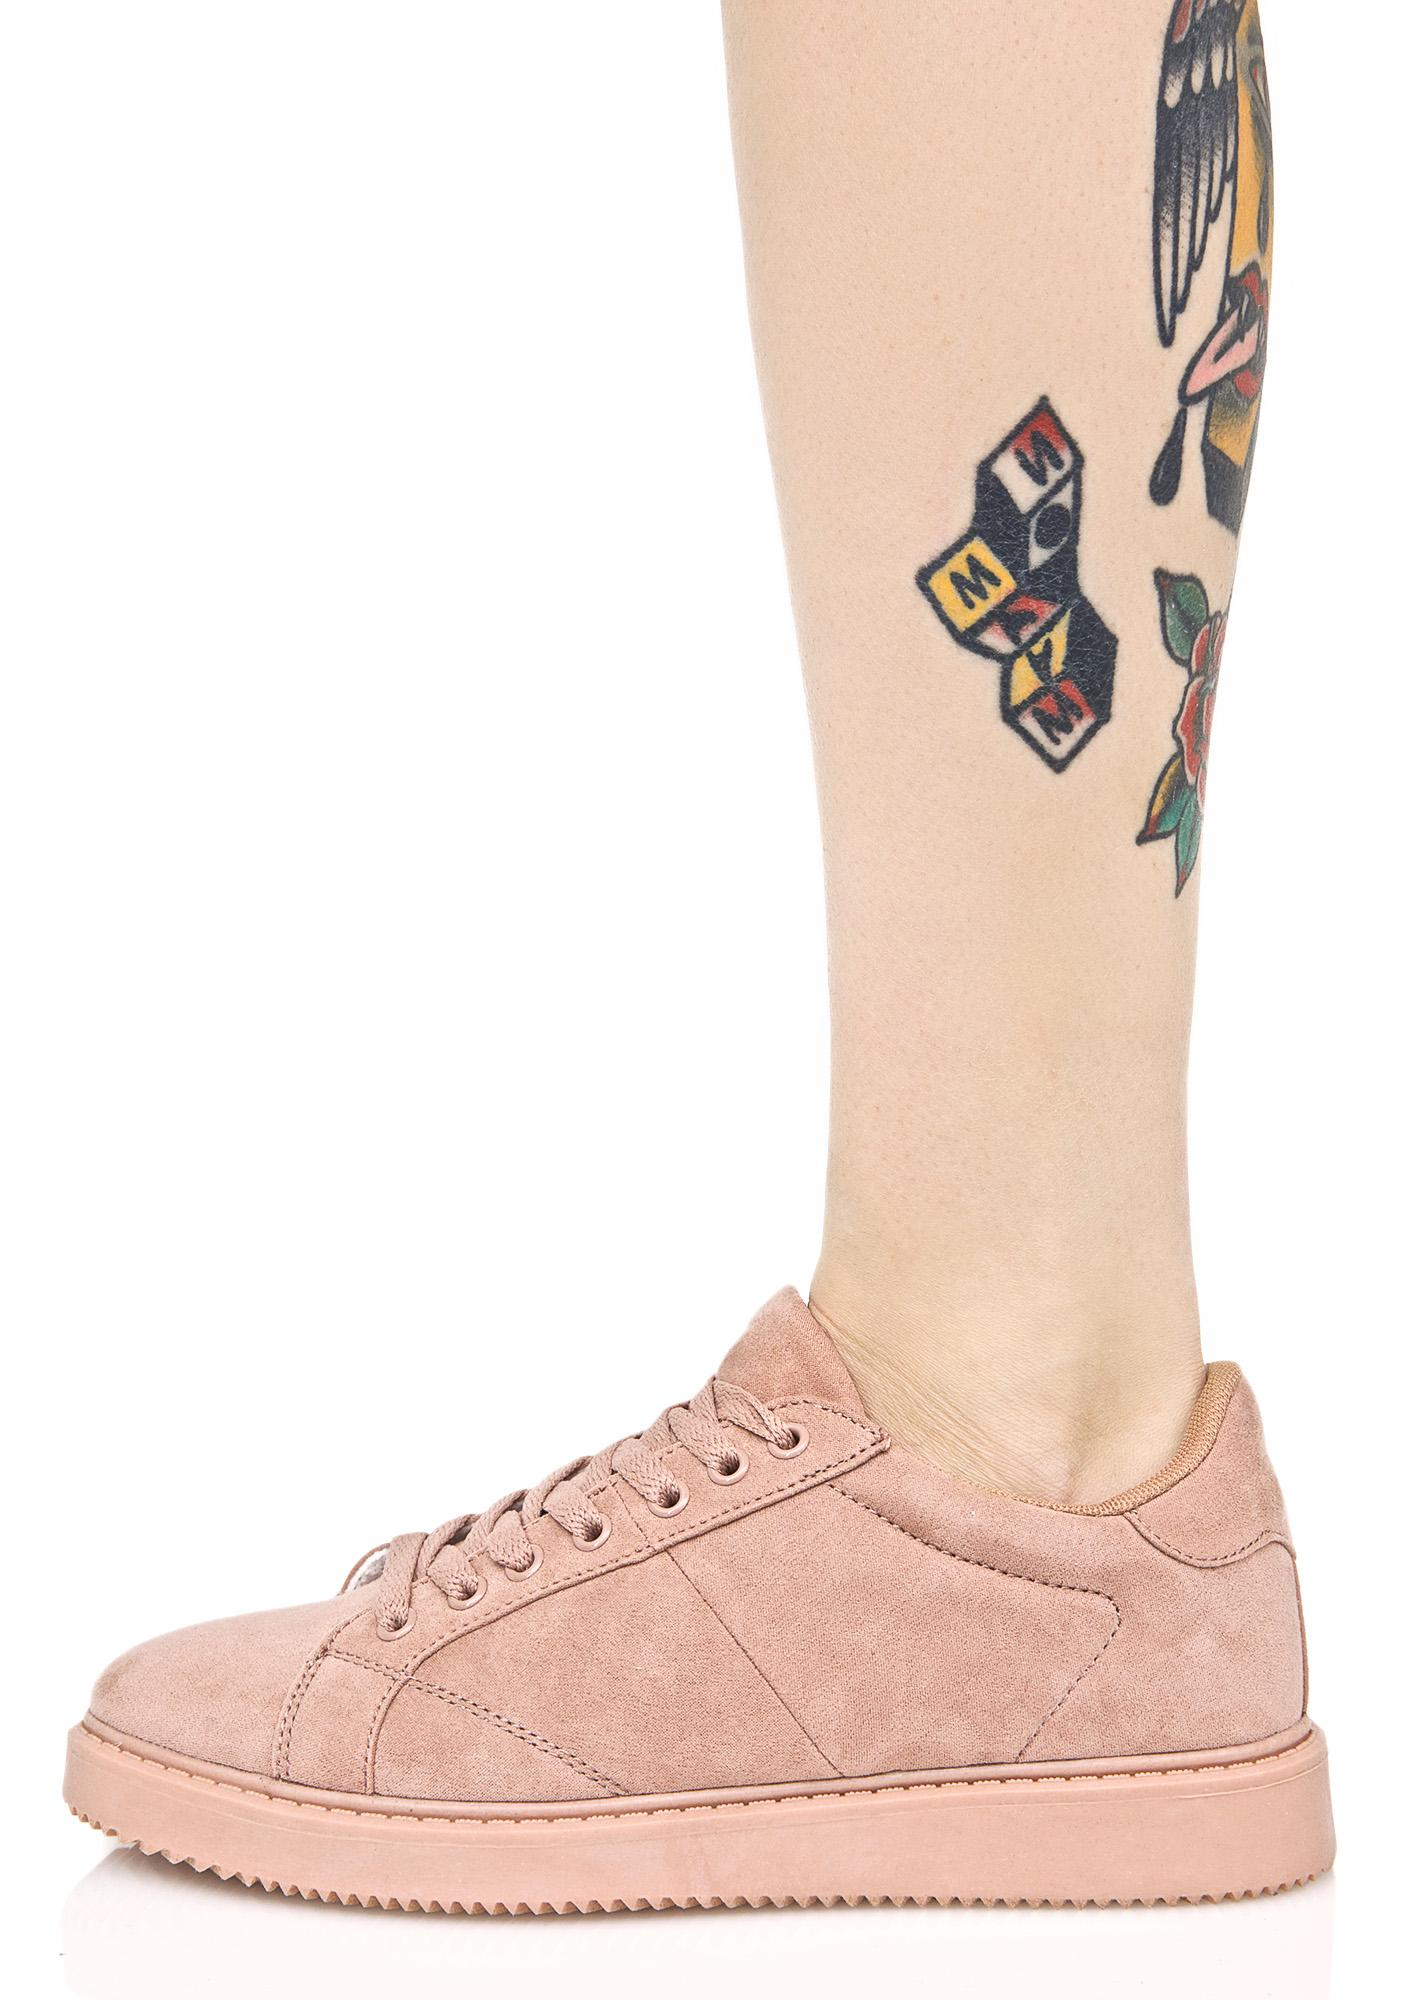 Rose Metro Monochrome Sneakers